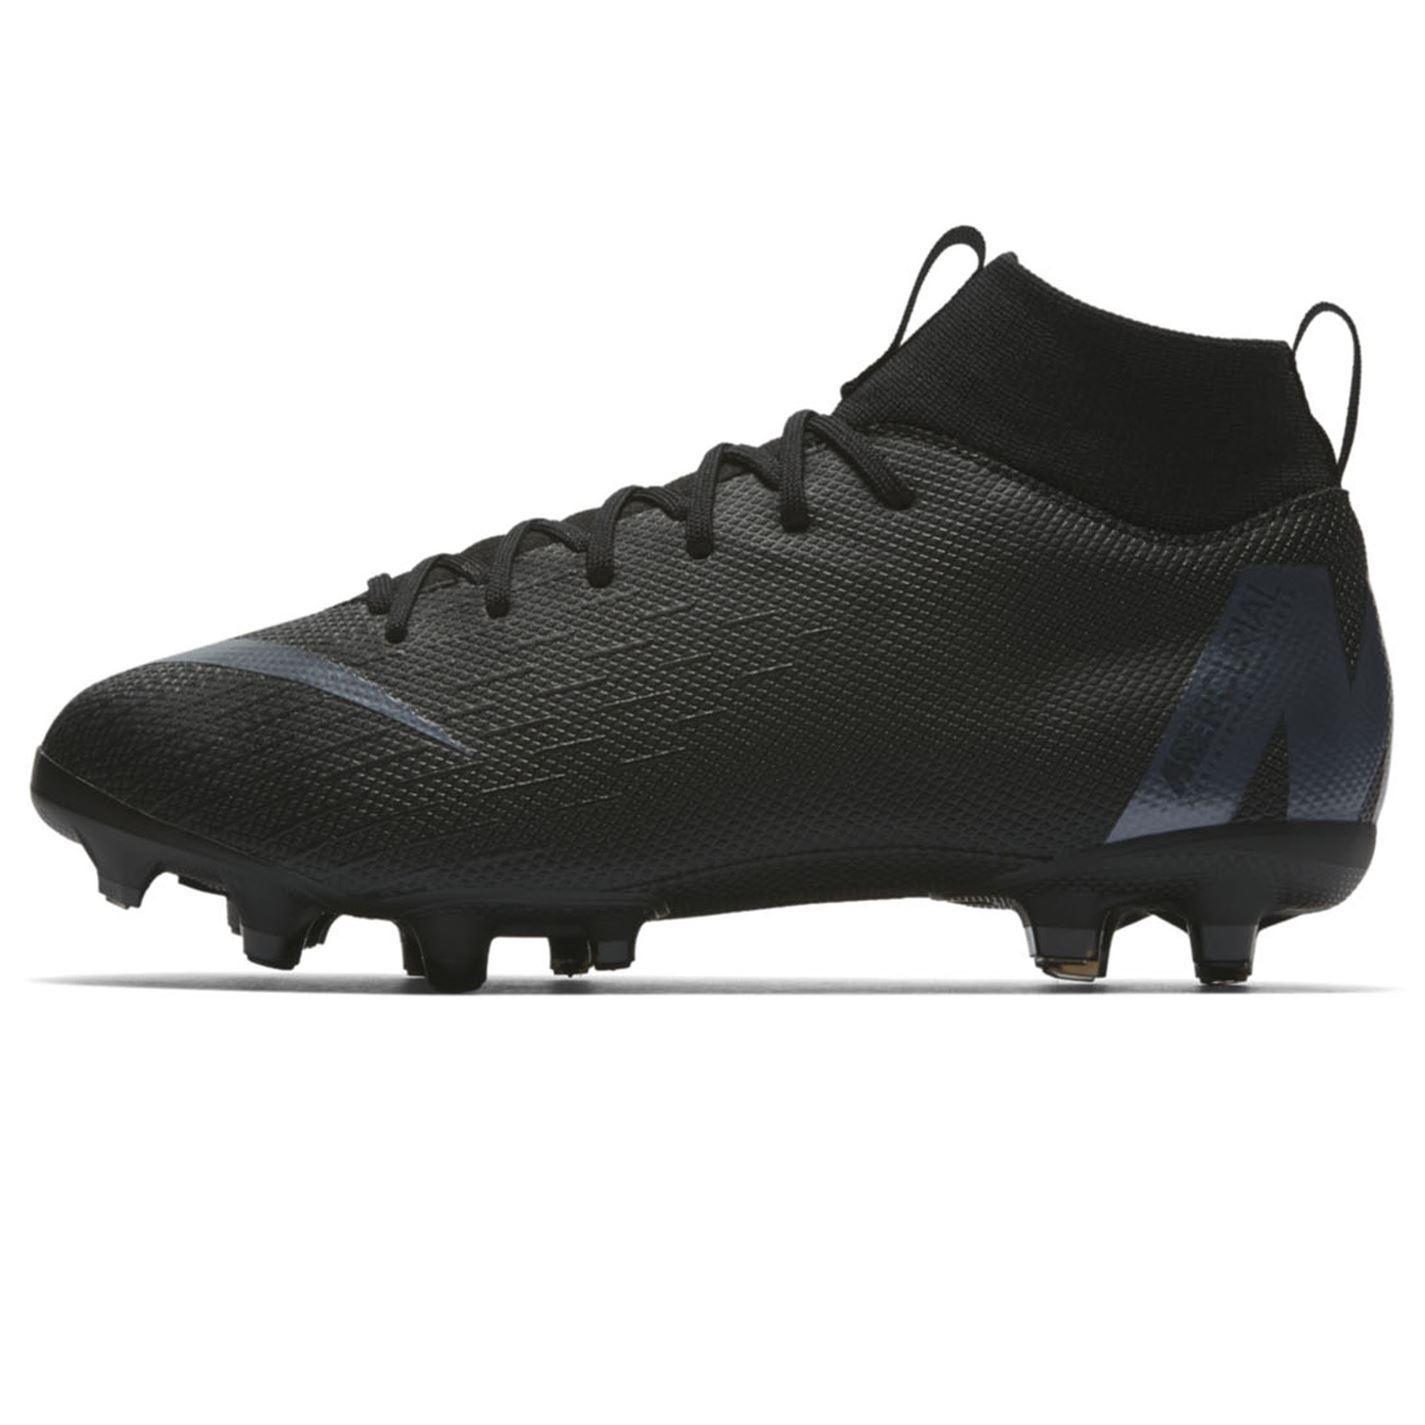 miniature 4 - Nike-Mercurial-Superfly-Academy-Terre-Ferme-Chaussures-De-Football-Juniors-Football-Crampons